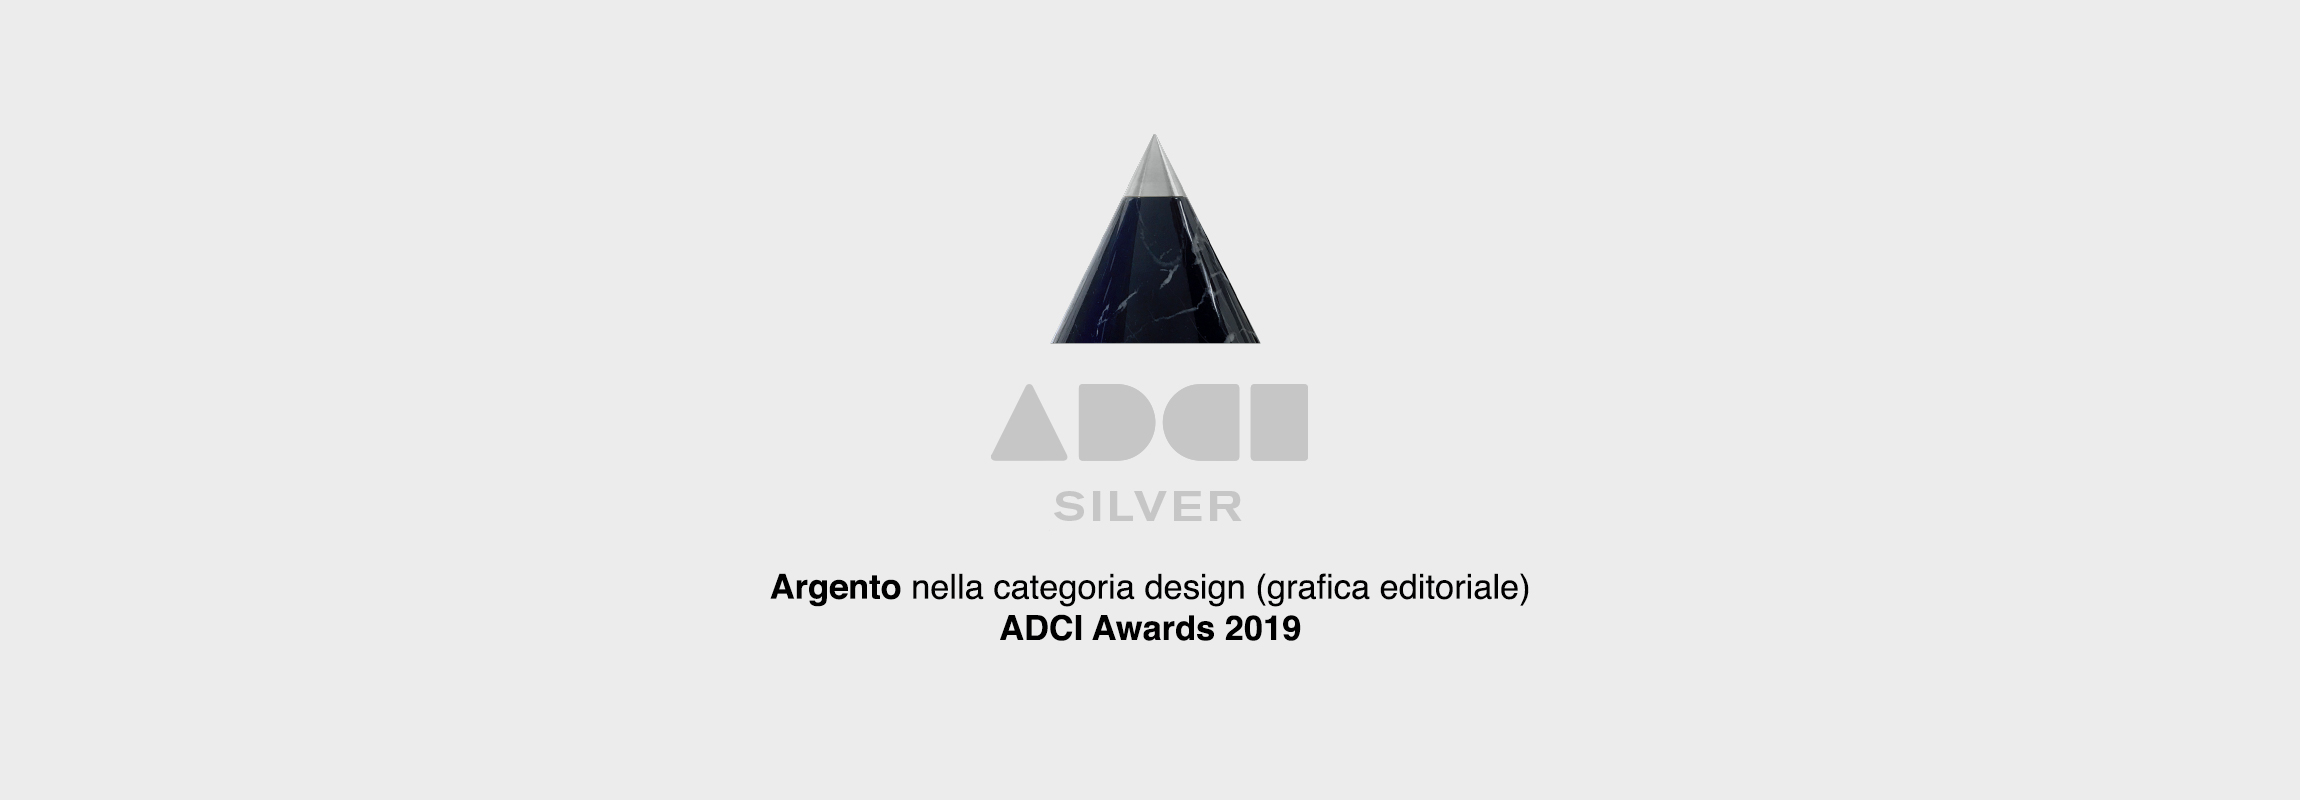 ADCI-FIRMA_new